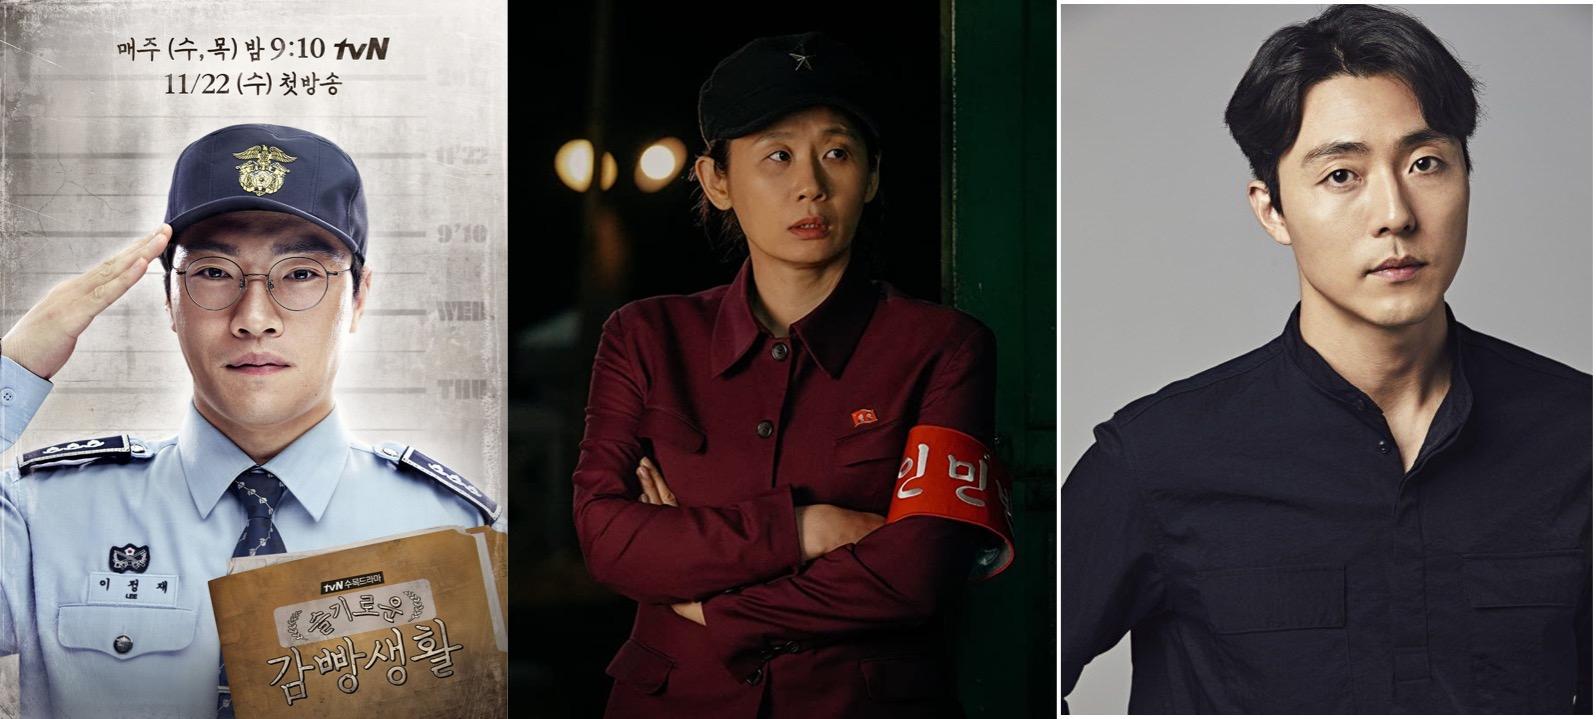 (Dari kiri ke kanan: Choi Young Woo, Lee Sun Young,  Lee Moo Saeng/ Foto: Courtesy of Soompi, IMDb, AsianWiki)